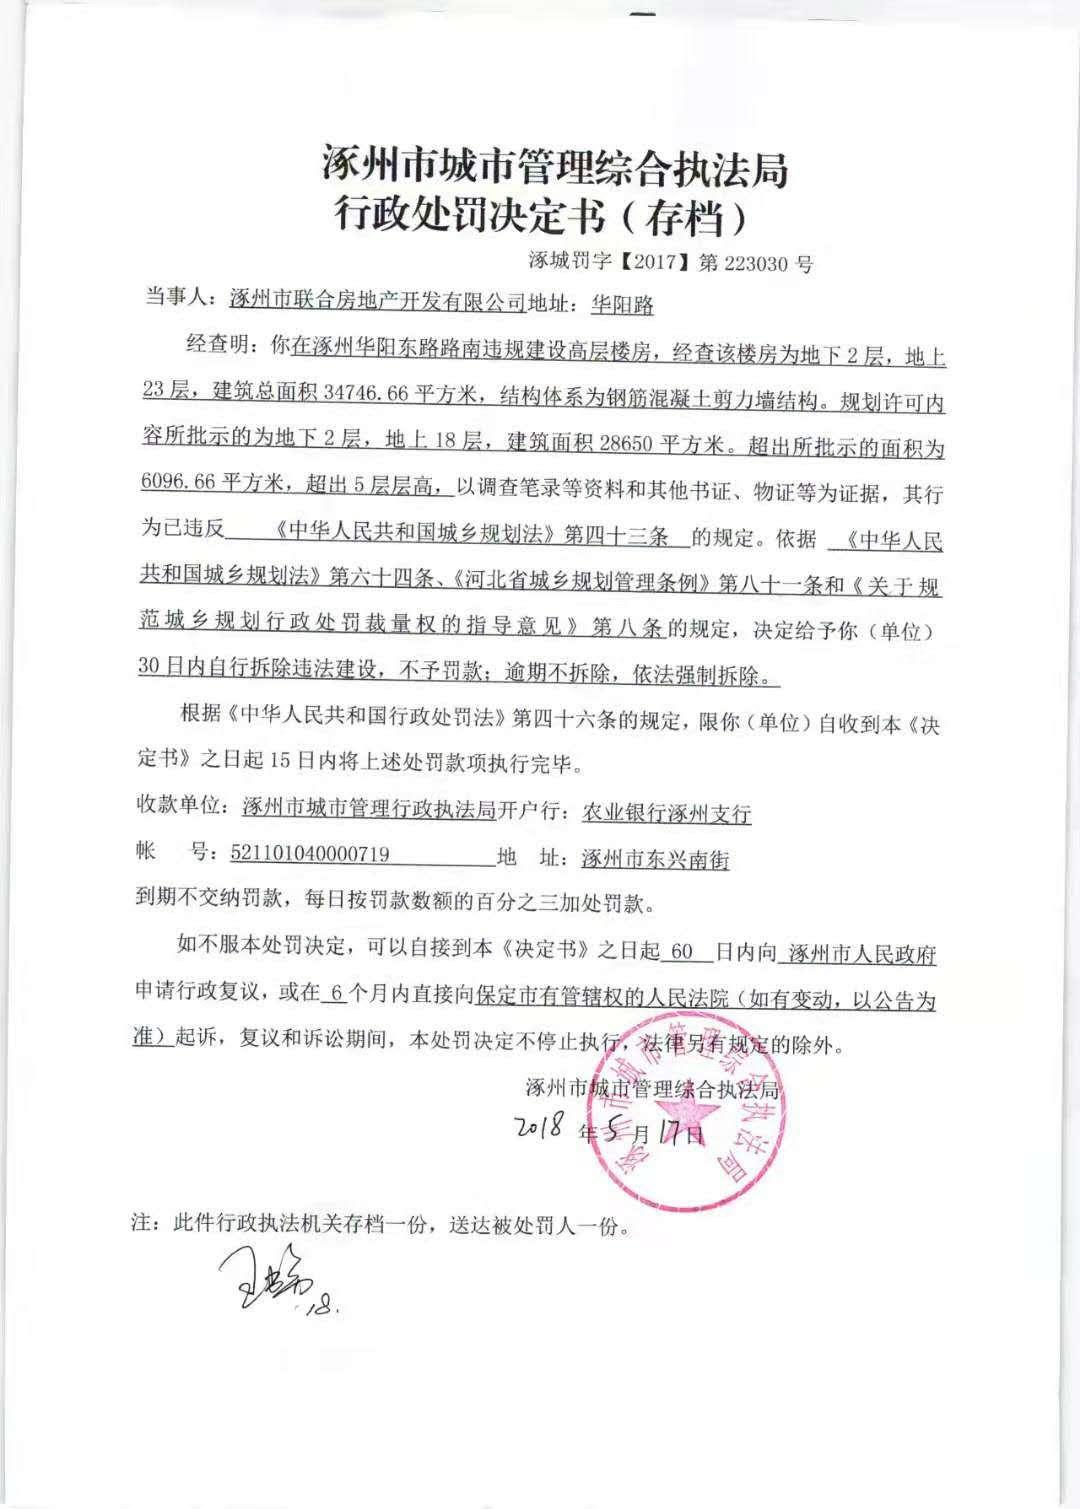 /baodingfangchan/106794.html